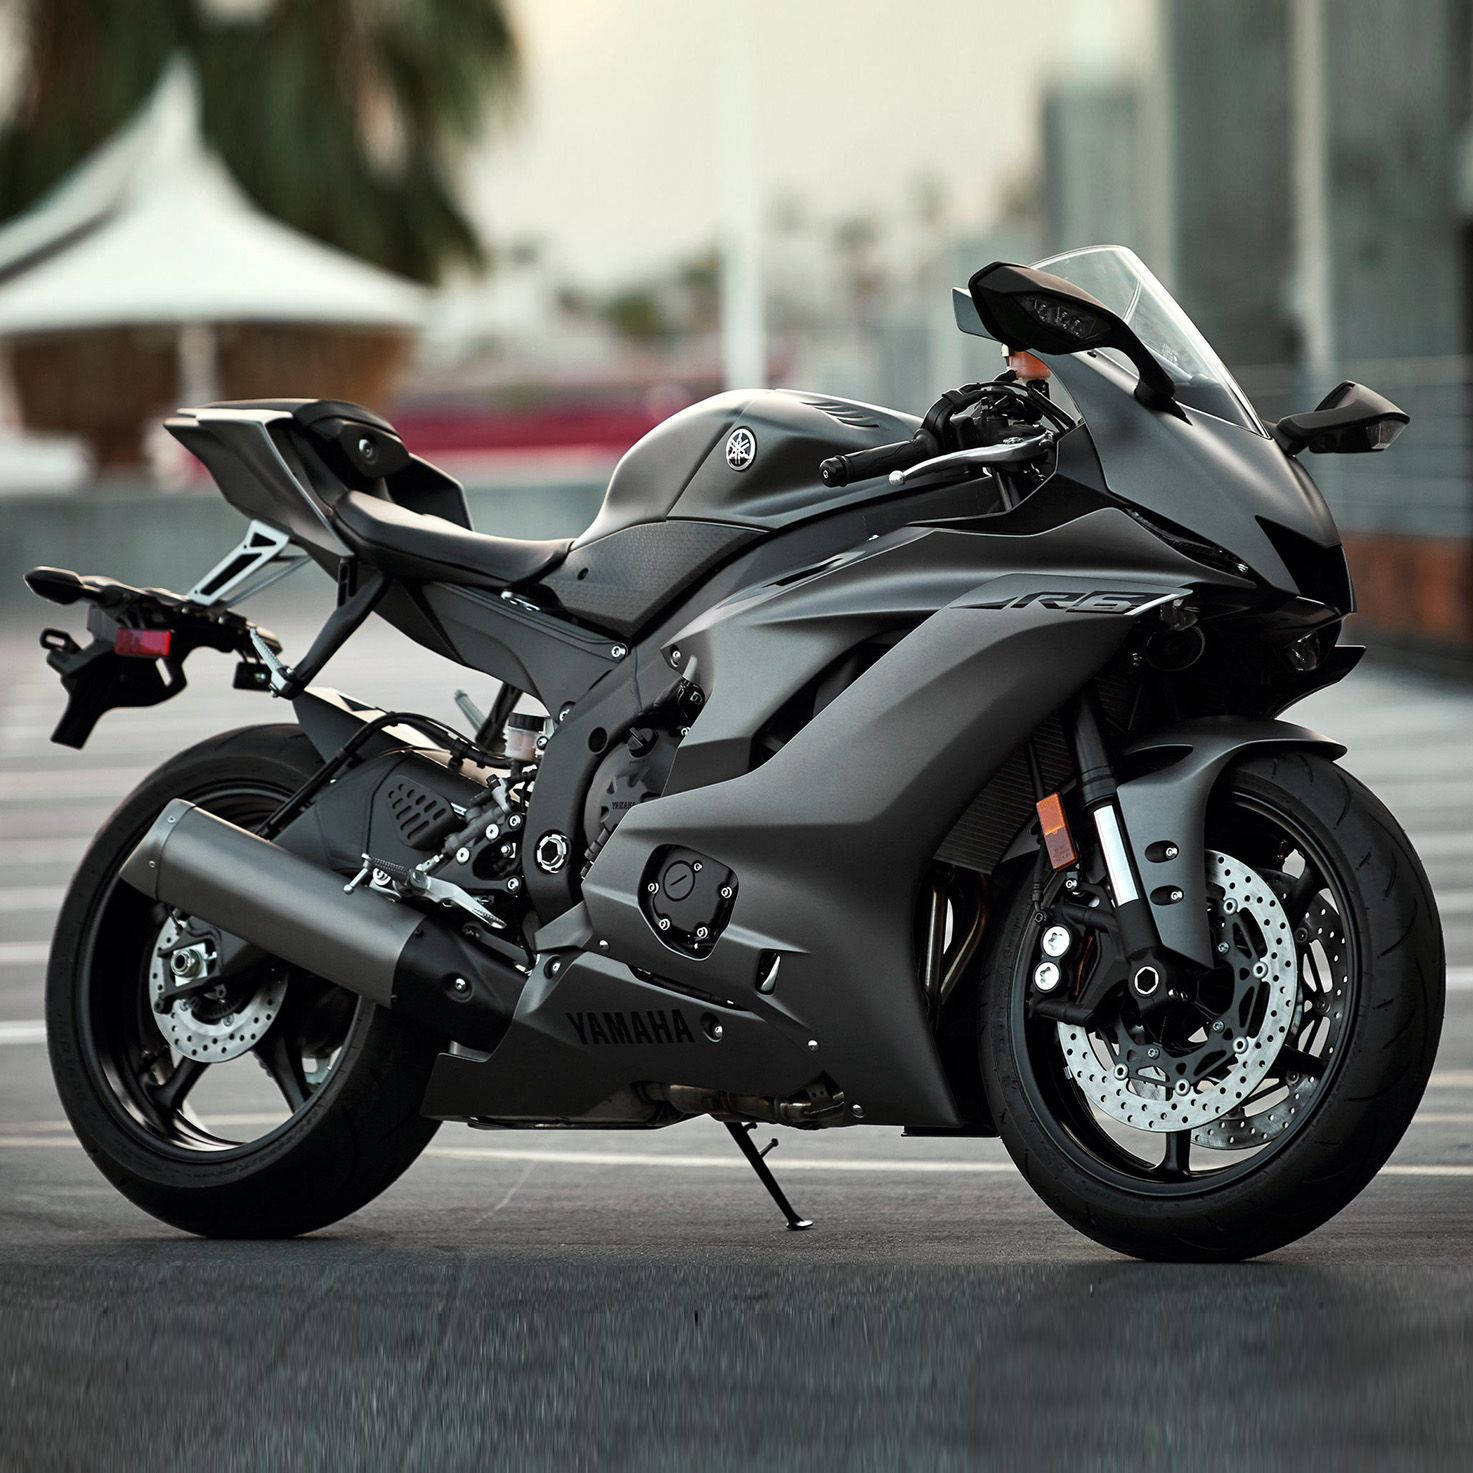 2018 Yamaha YZF-R6 - www facebook com/GarvsMeanMachine   M-cycles